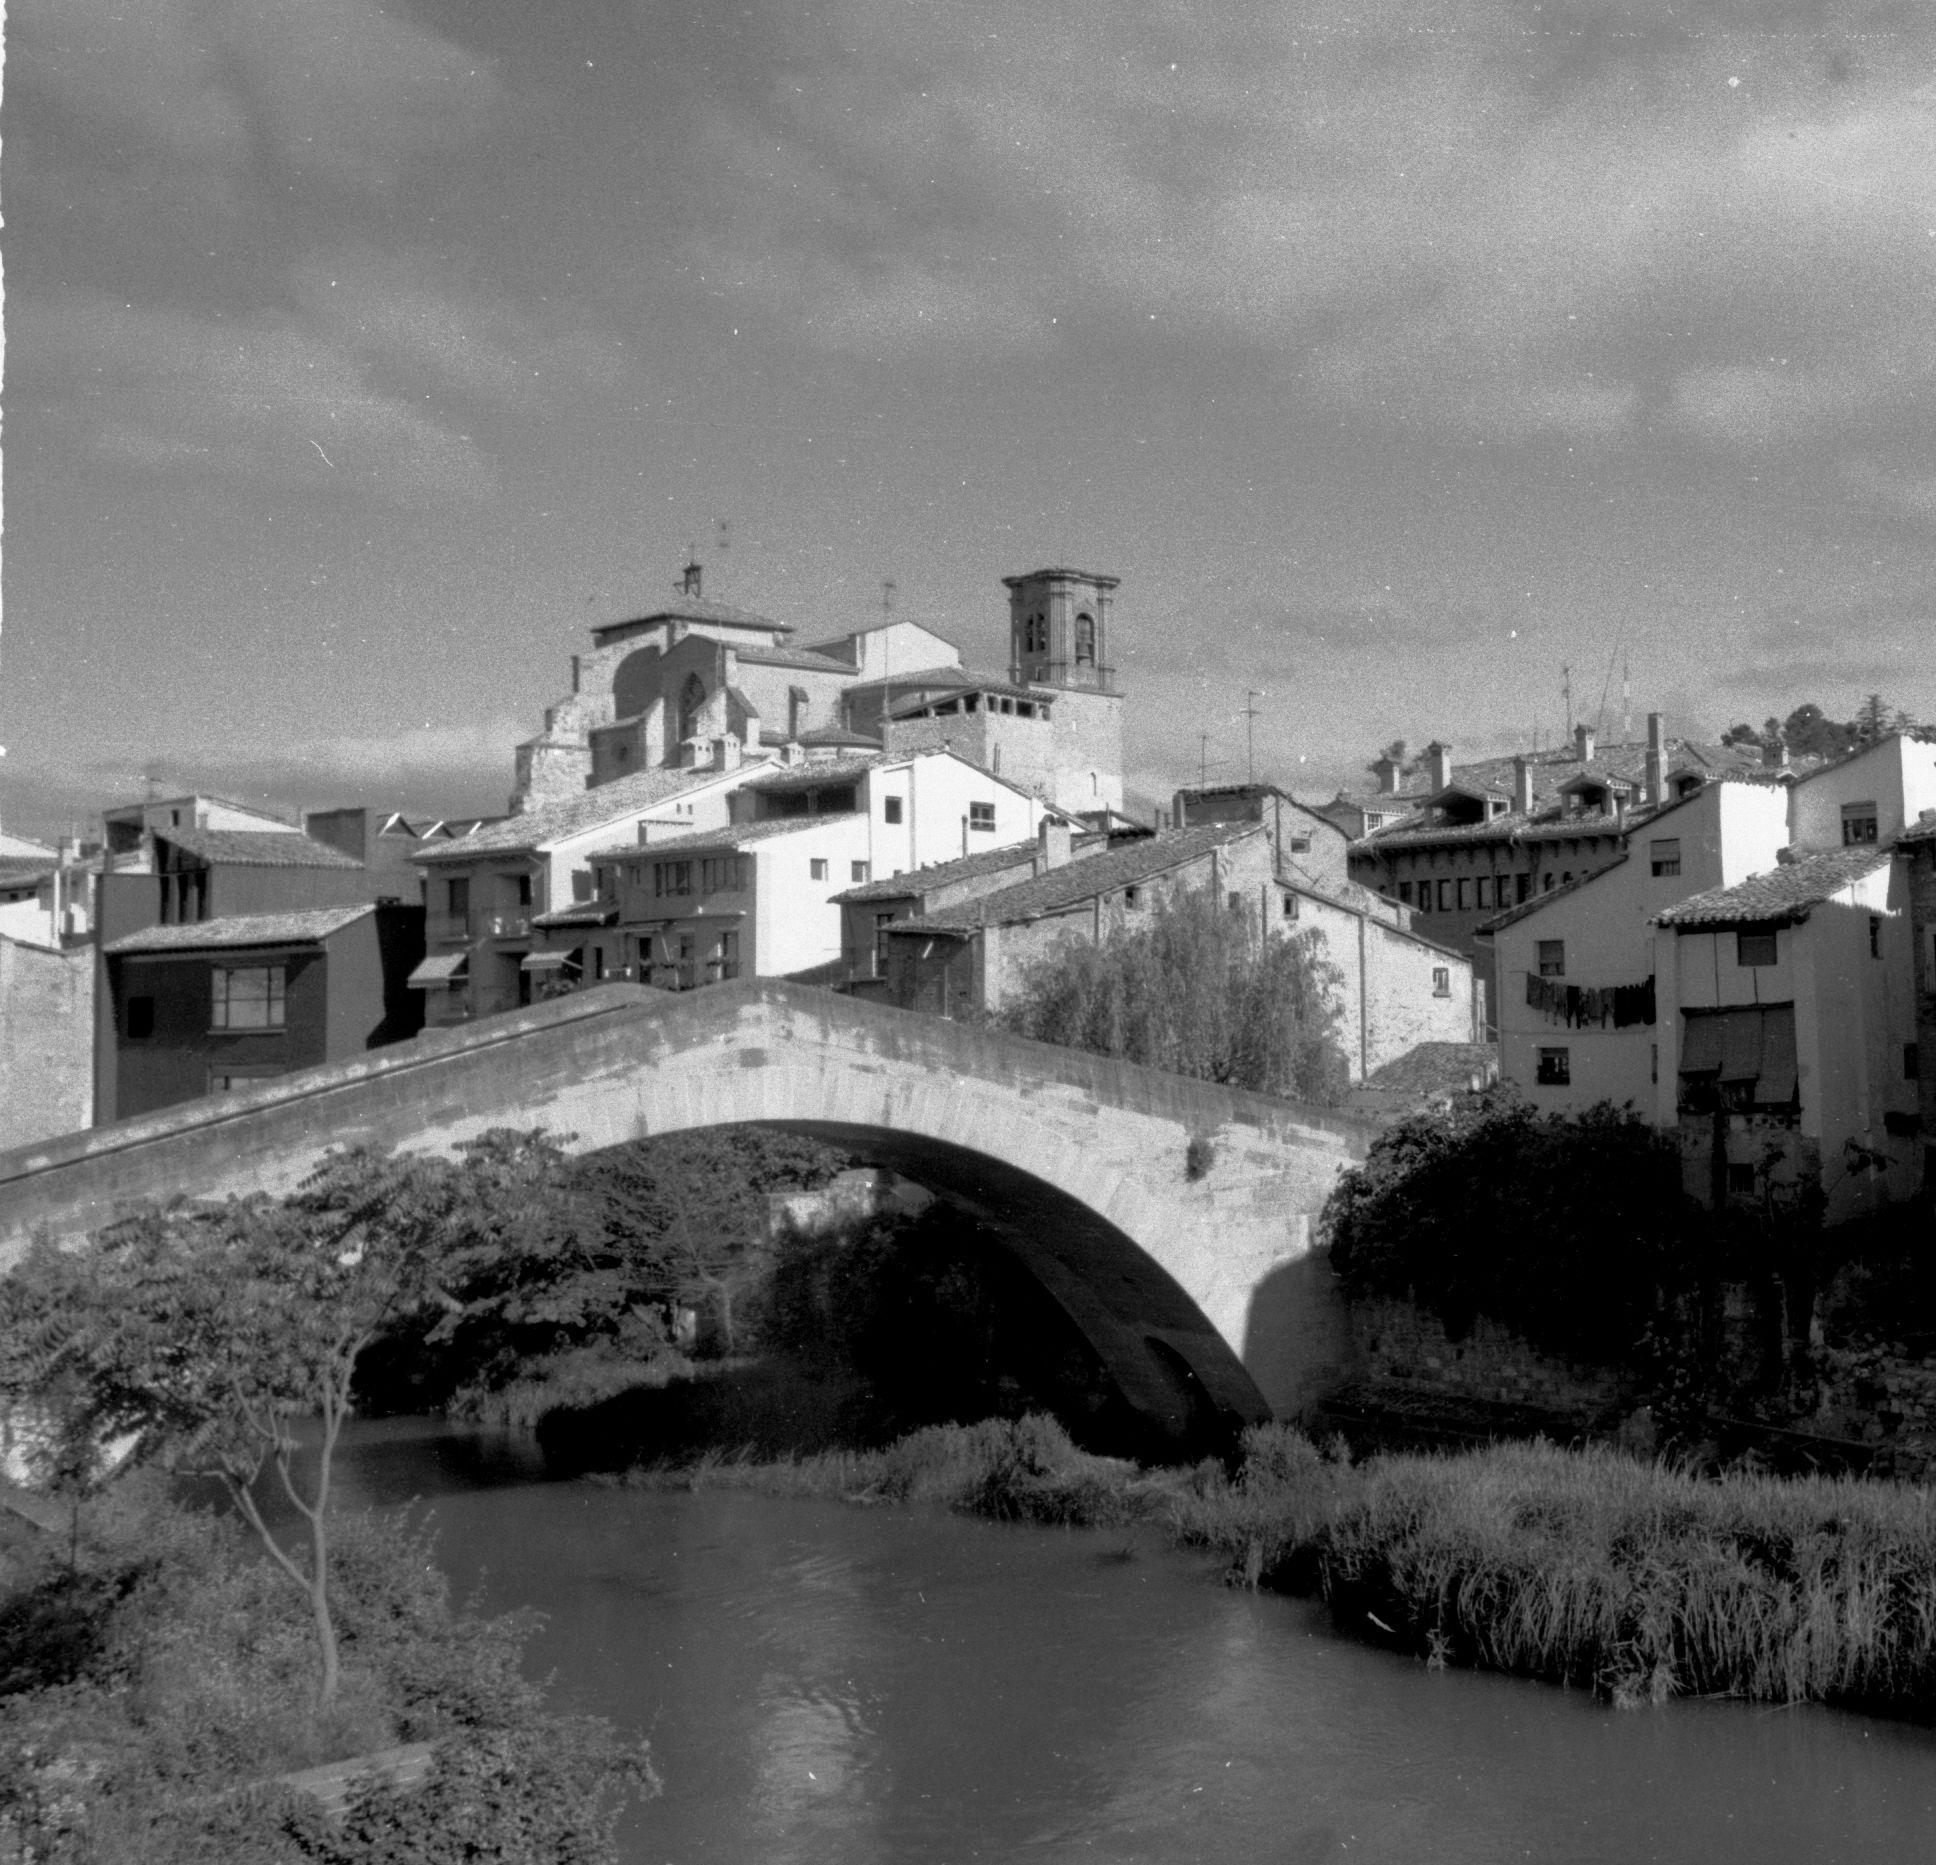 Estella_gammla bron2.jpg